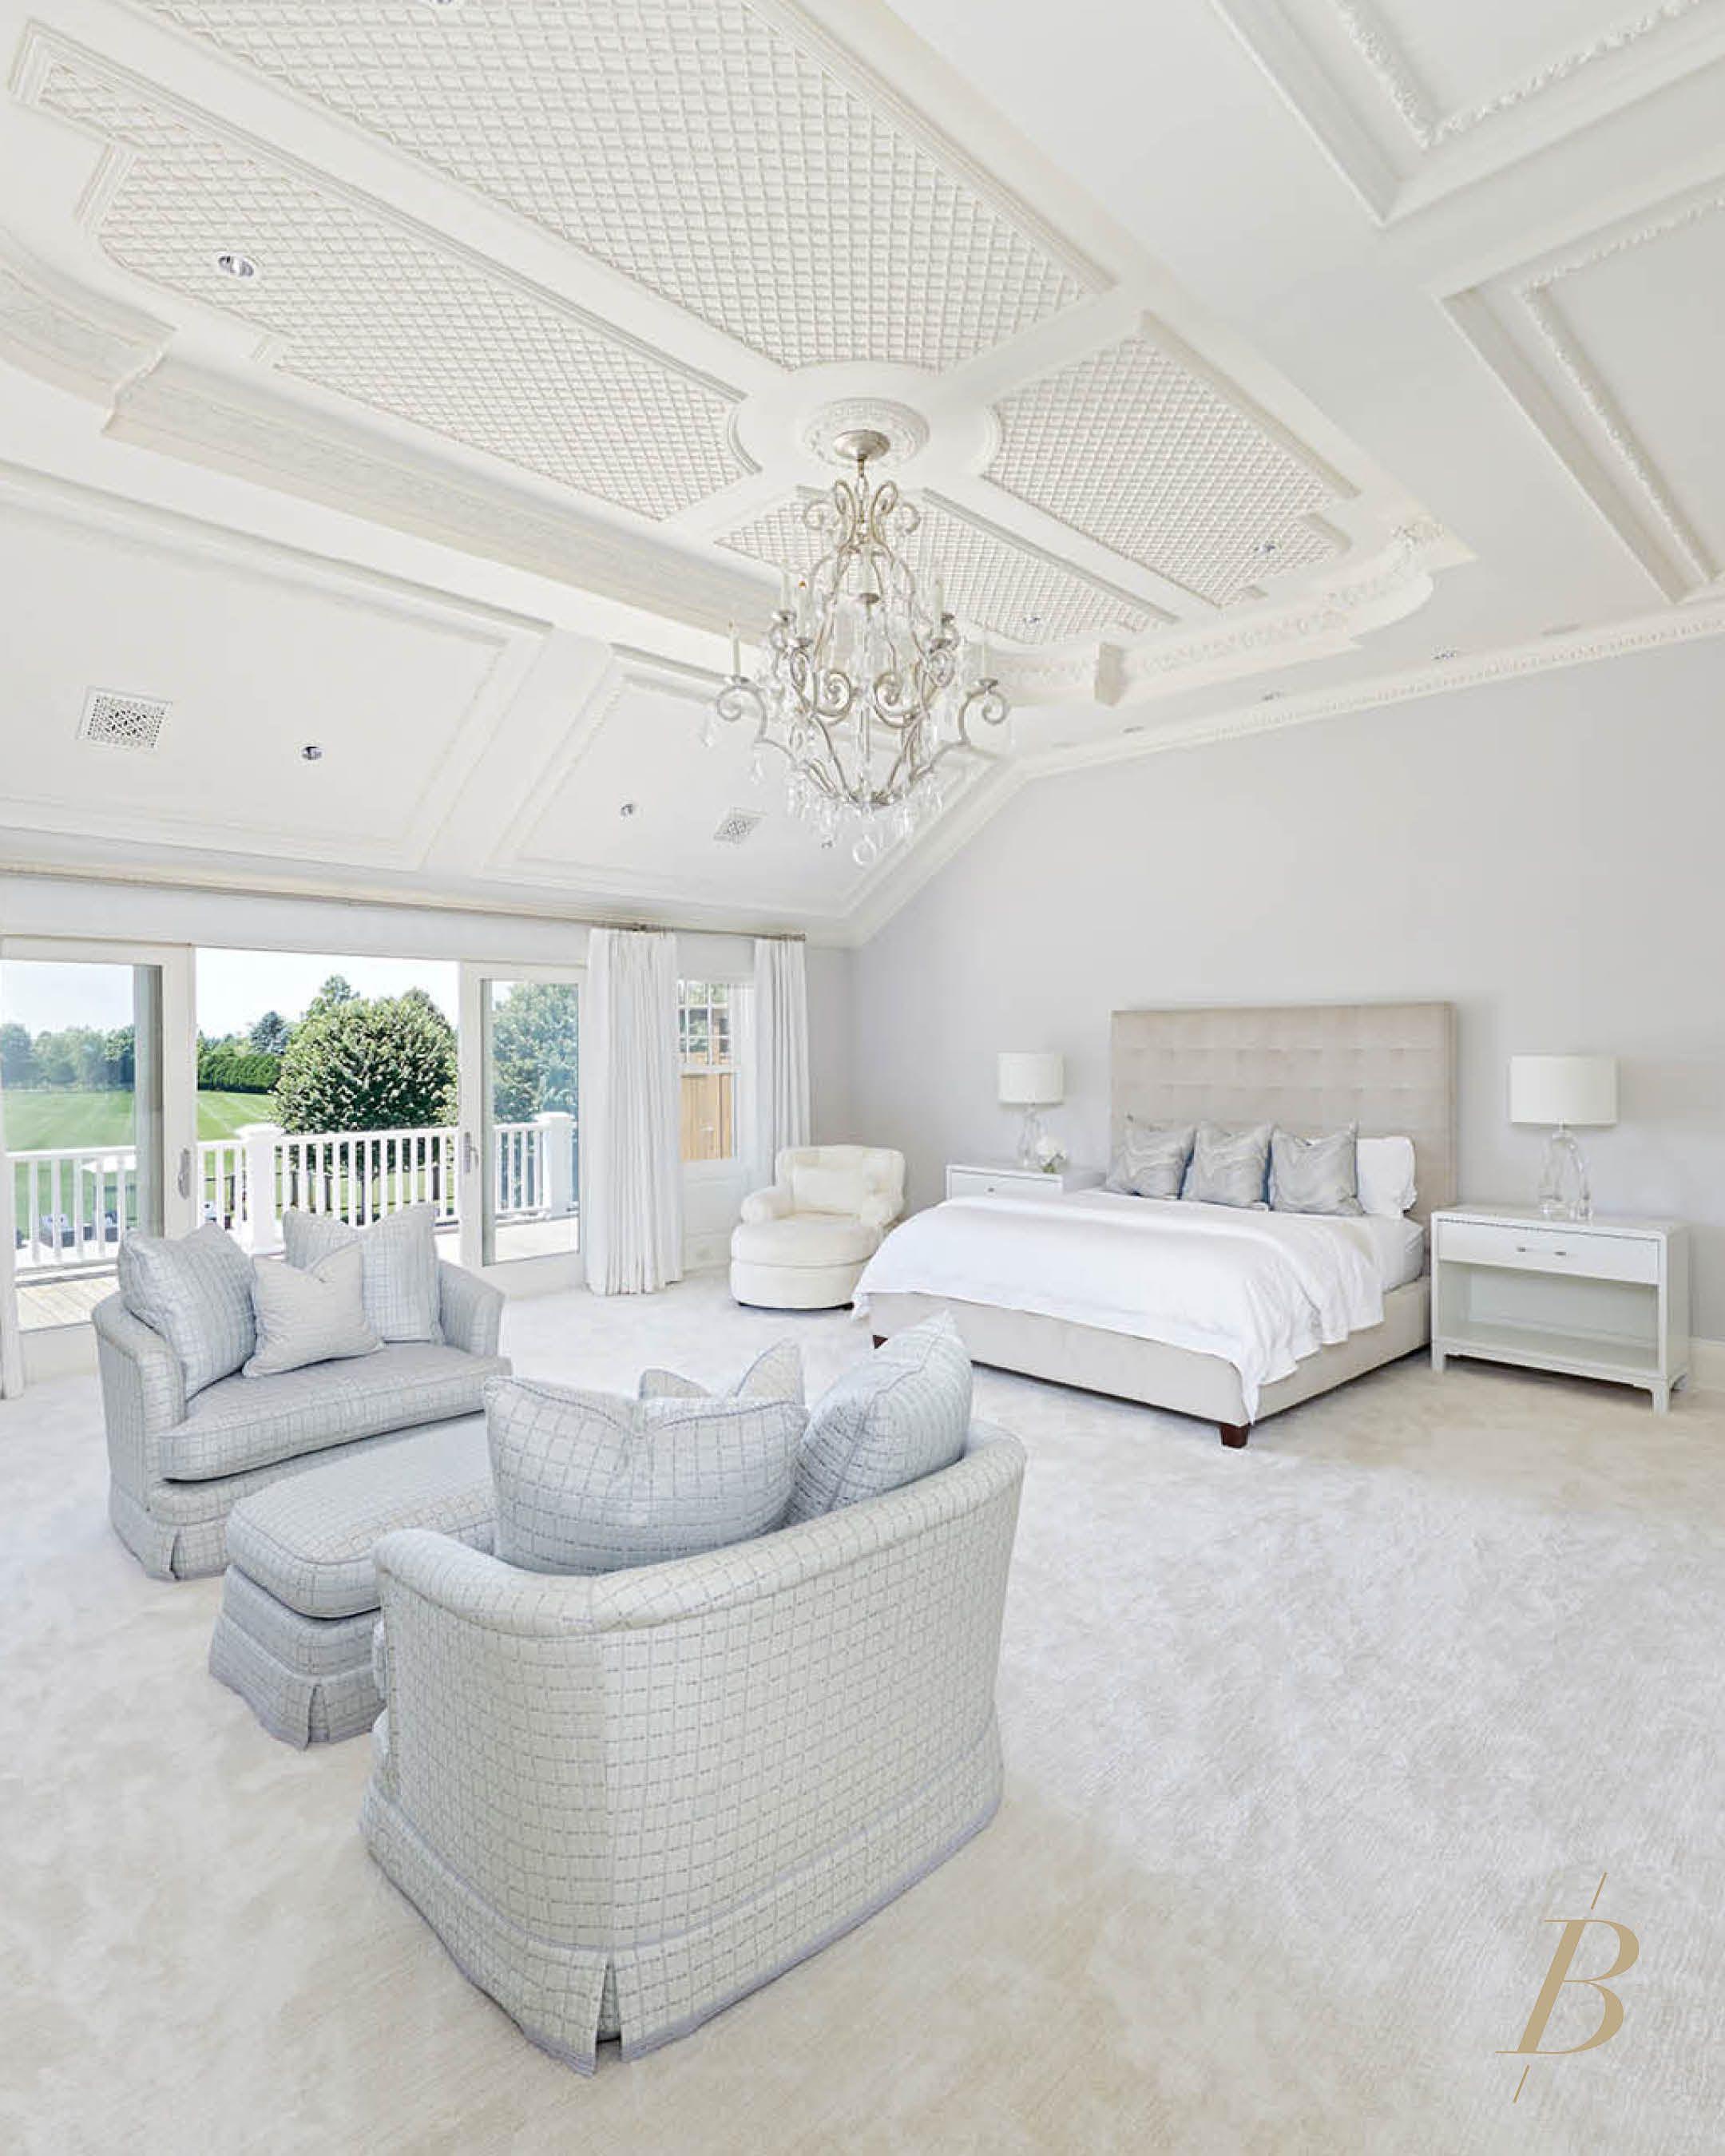 Sandcastle Bridgehampton Ny Hampton Real Estate Bridgehampton Sand Castle Long Island Mansion